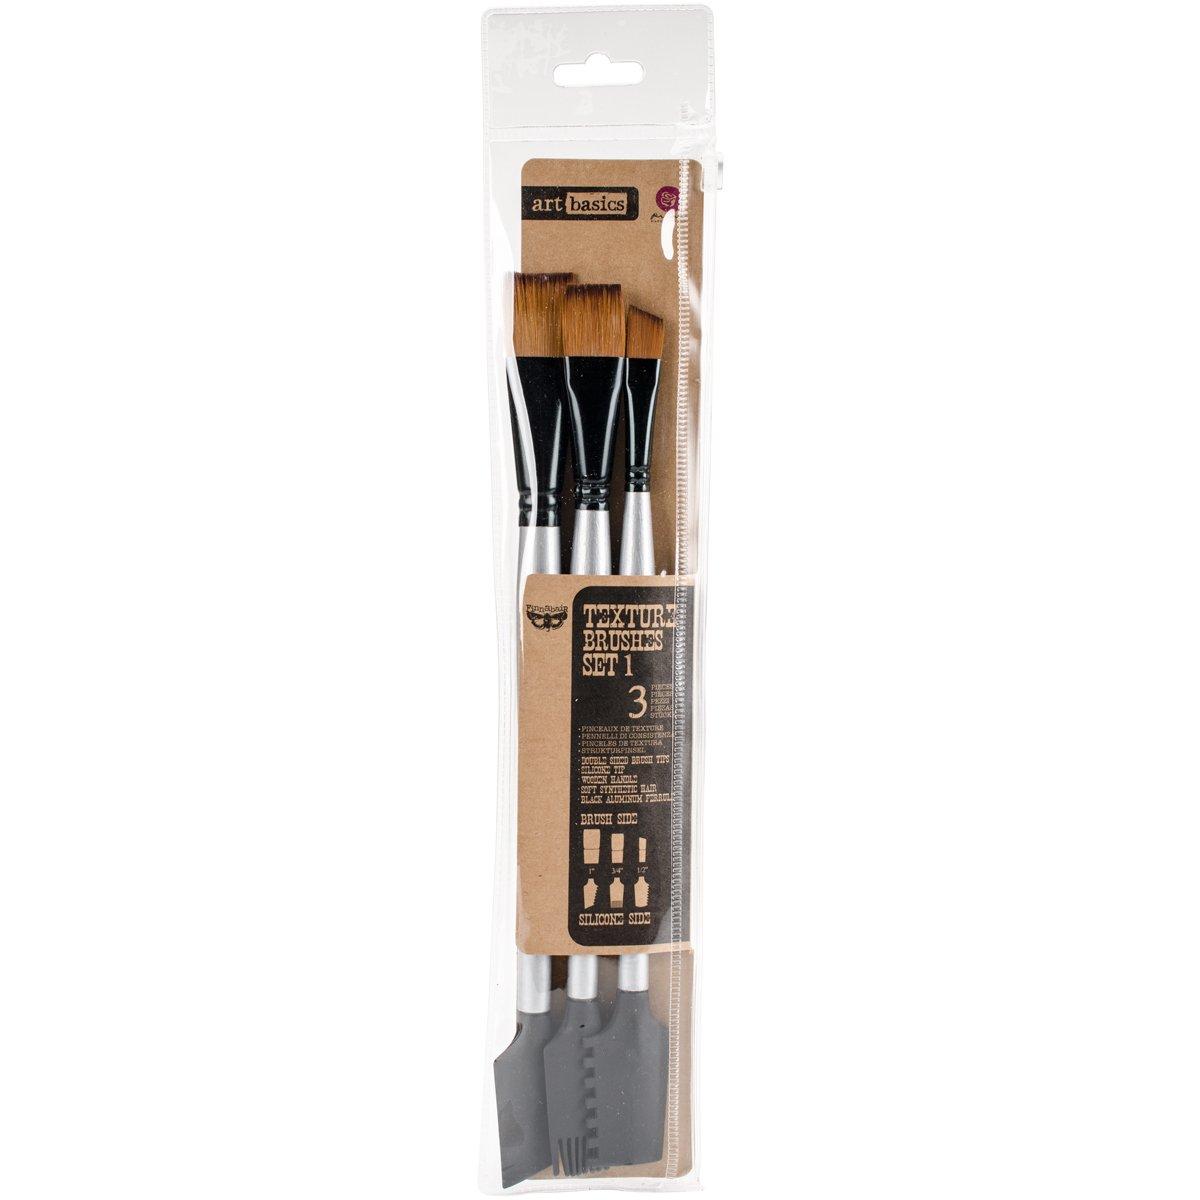 Prima Marketing 963873 Texture No.1 Finnabair Art Basics Double Ended Brush Set (3/Pack), Silver